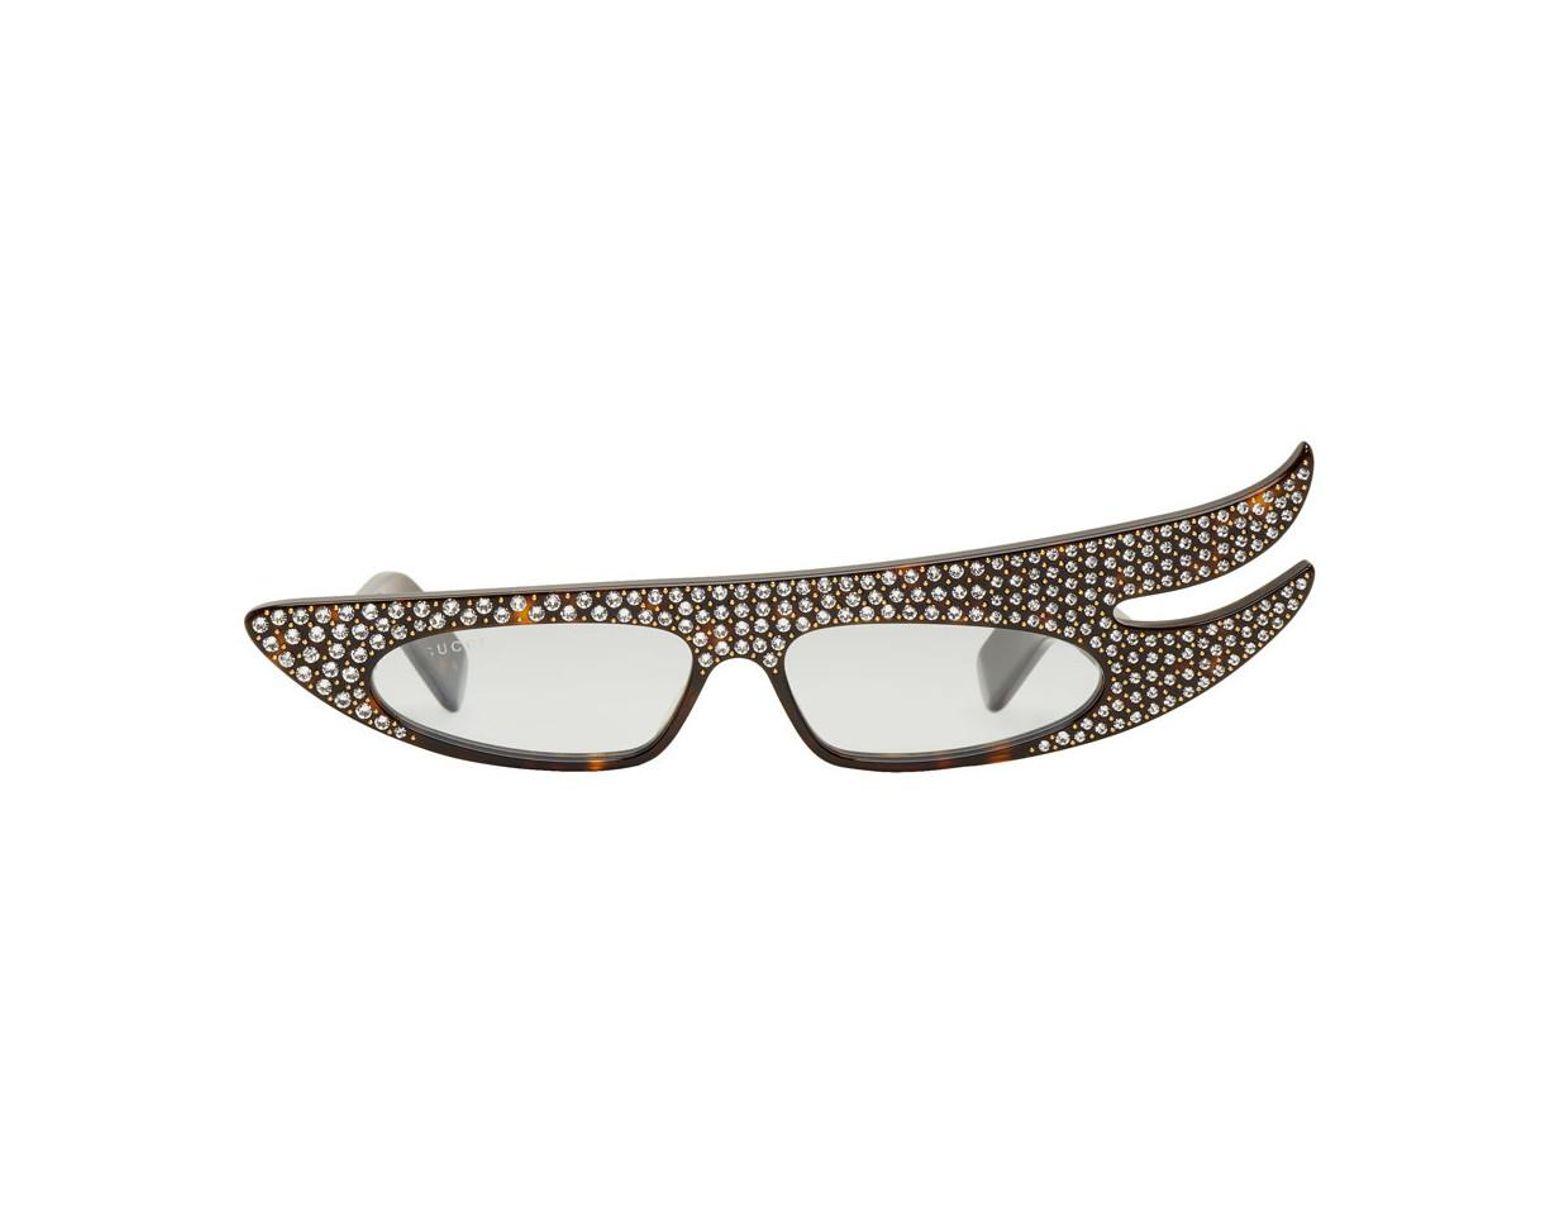 b1b6b0cff Gucci Tortoiseshell Asymmetric Rhinestone Sunglasses for Men - Lyst